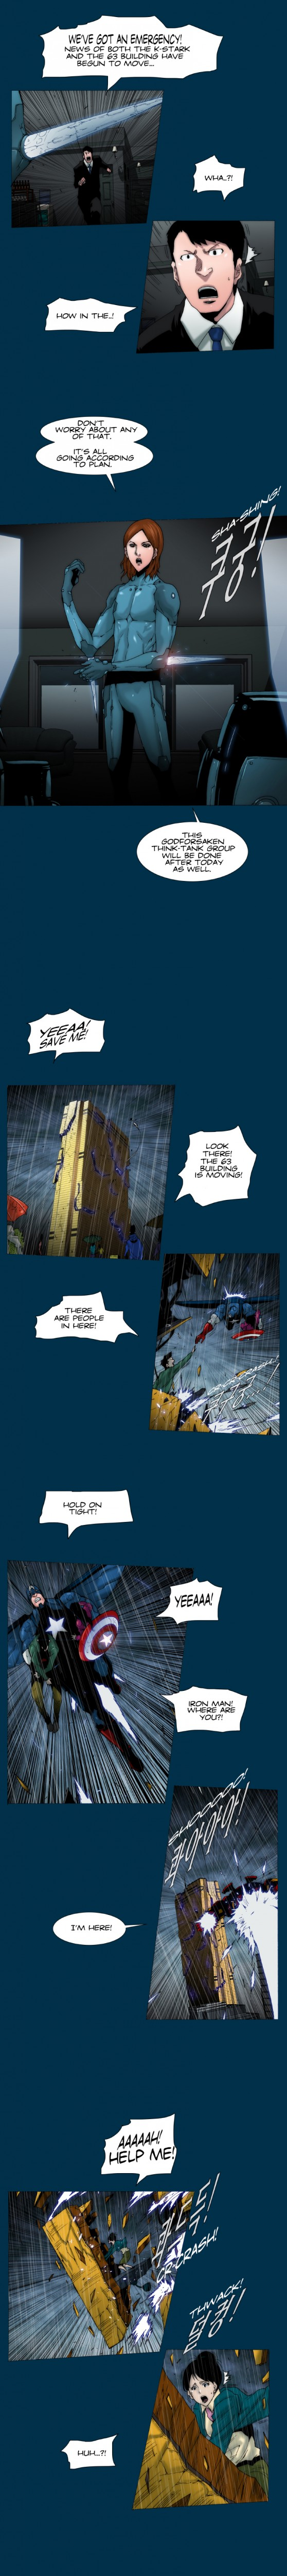 avengers-electric-rain-11-2